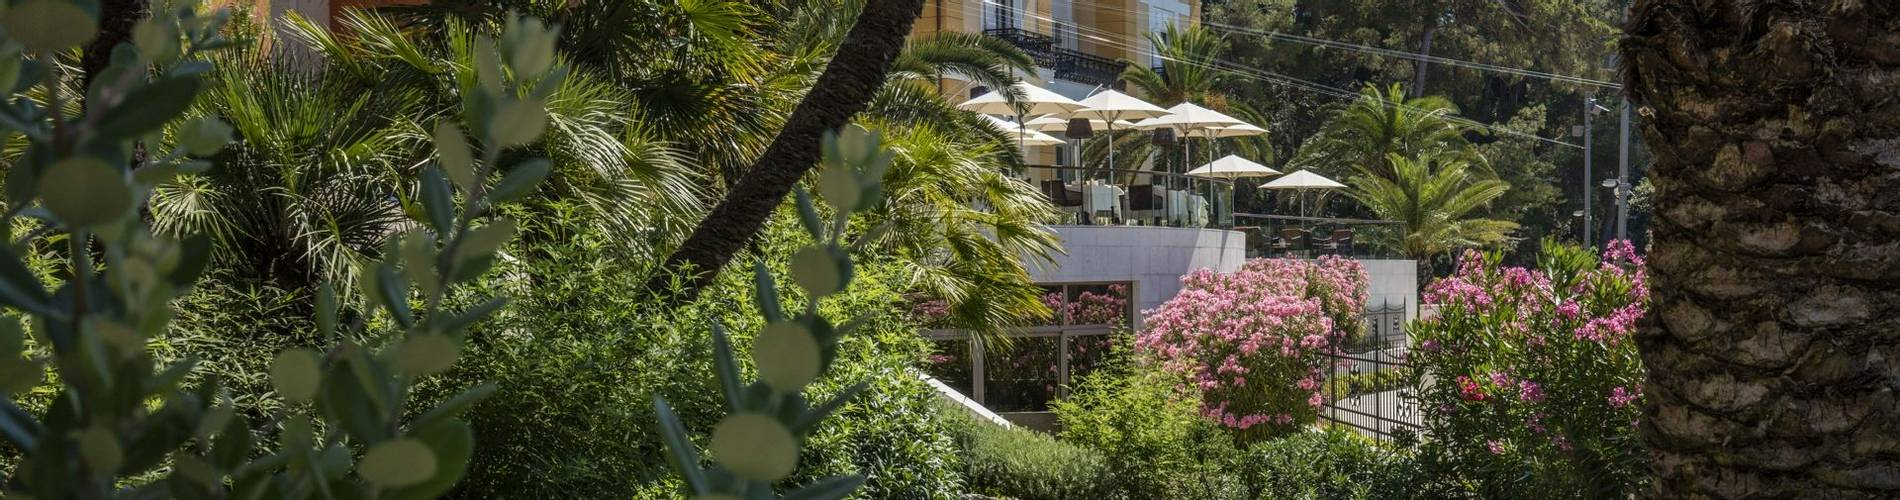 12. Boutique Hotel Alhambra (2) (1).jpg